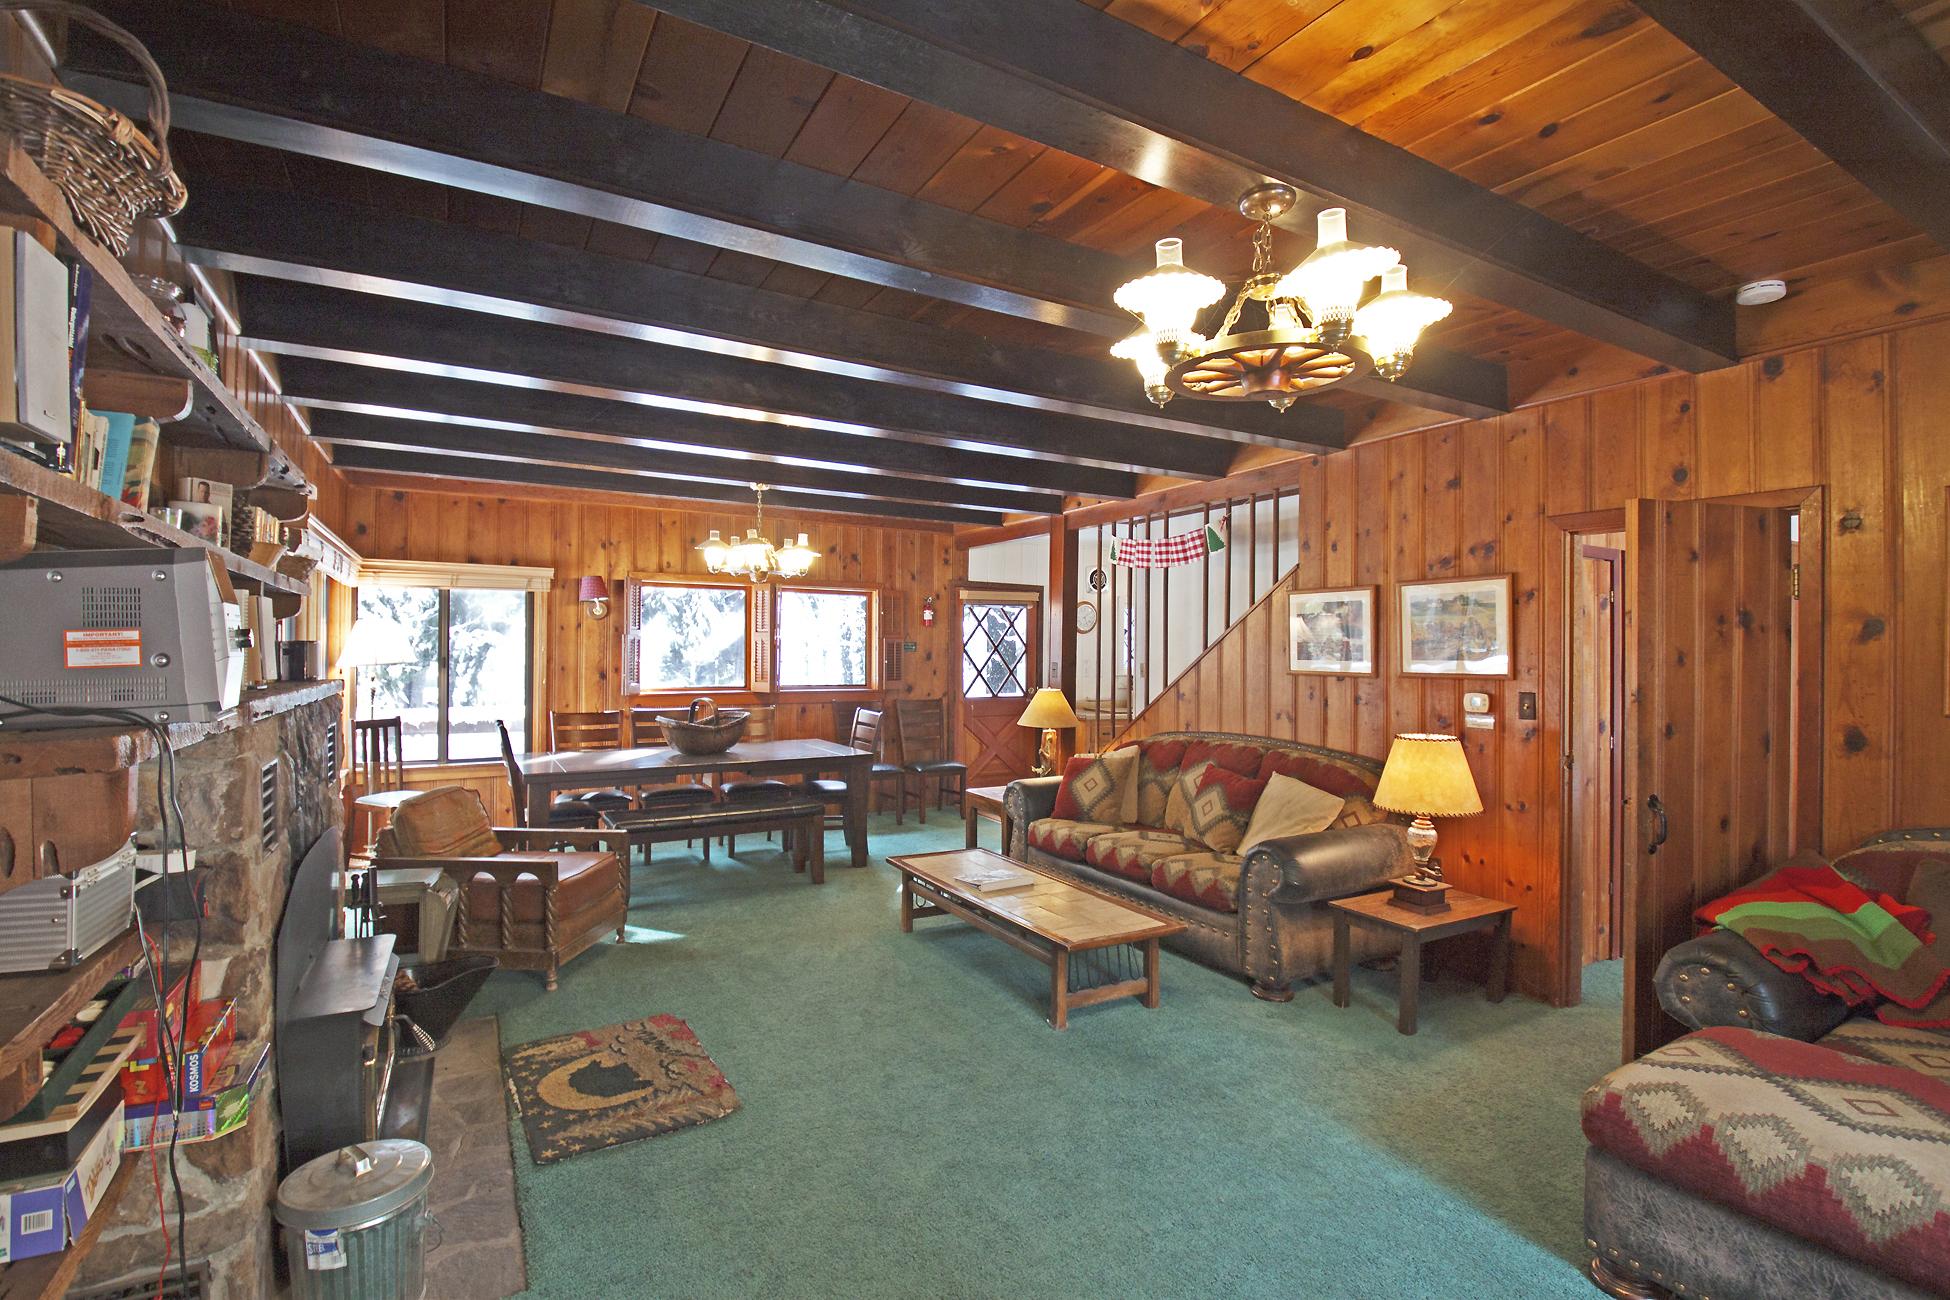 Listing Image 2 for Quandt Cabin